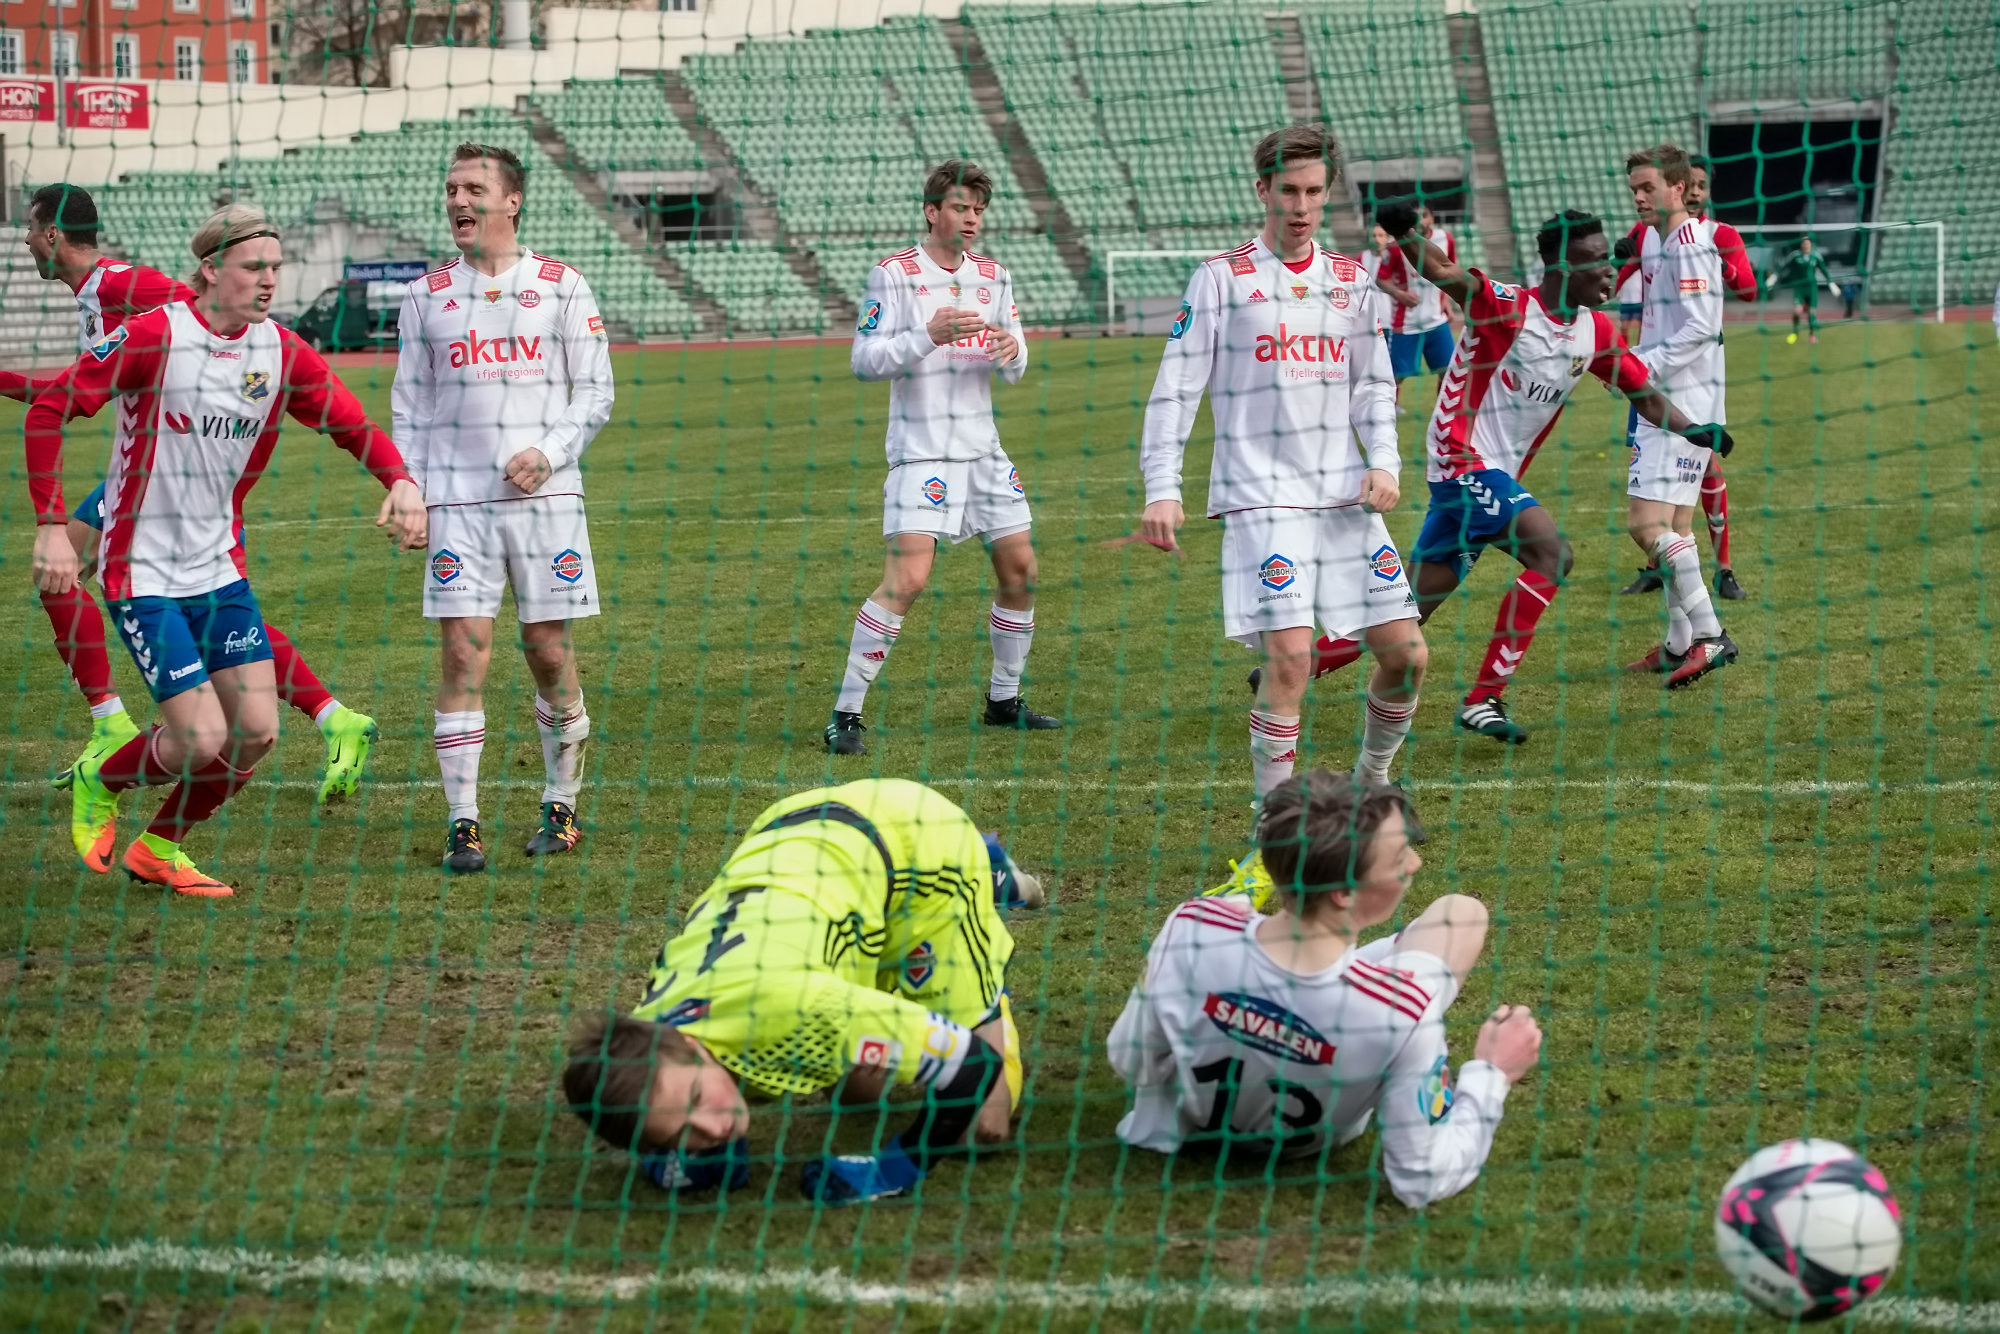 Conde scoret i debuten på Bislett, uten at vi helt vet hvordan (foto: Lars Opstad/www.kladd.no)